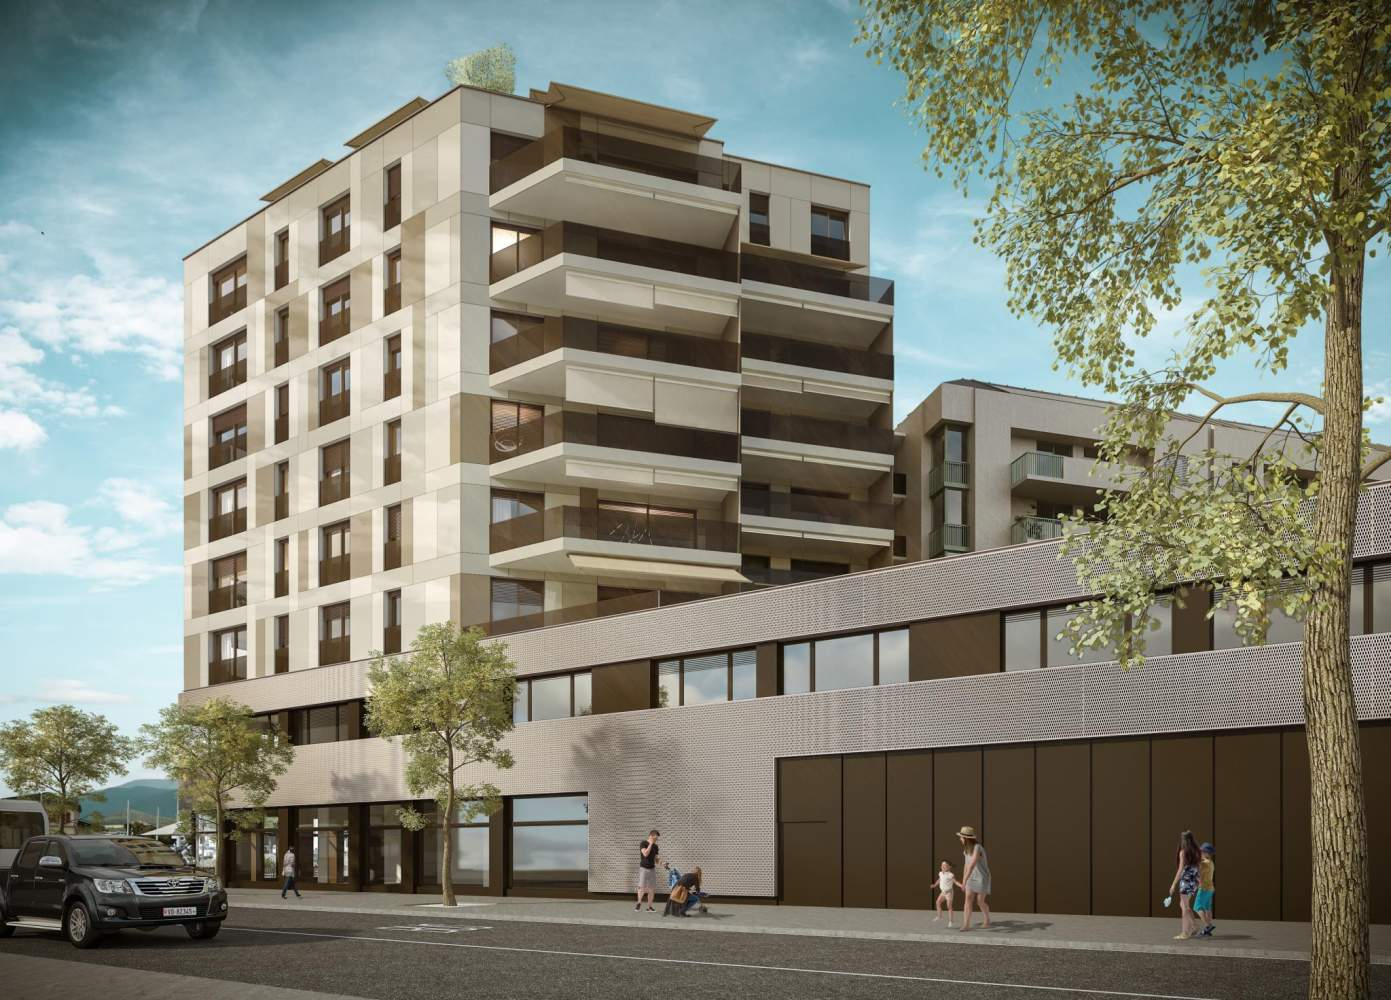 Chêne-Bourg  - Appartement 4 Pièces 2 Chambres - picture 1